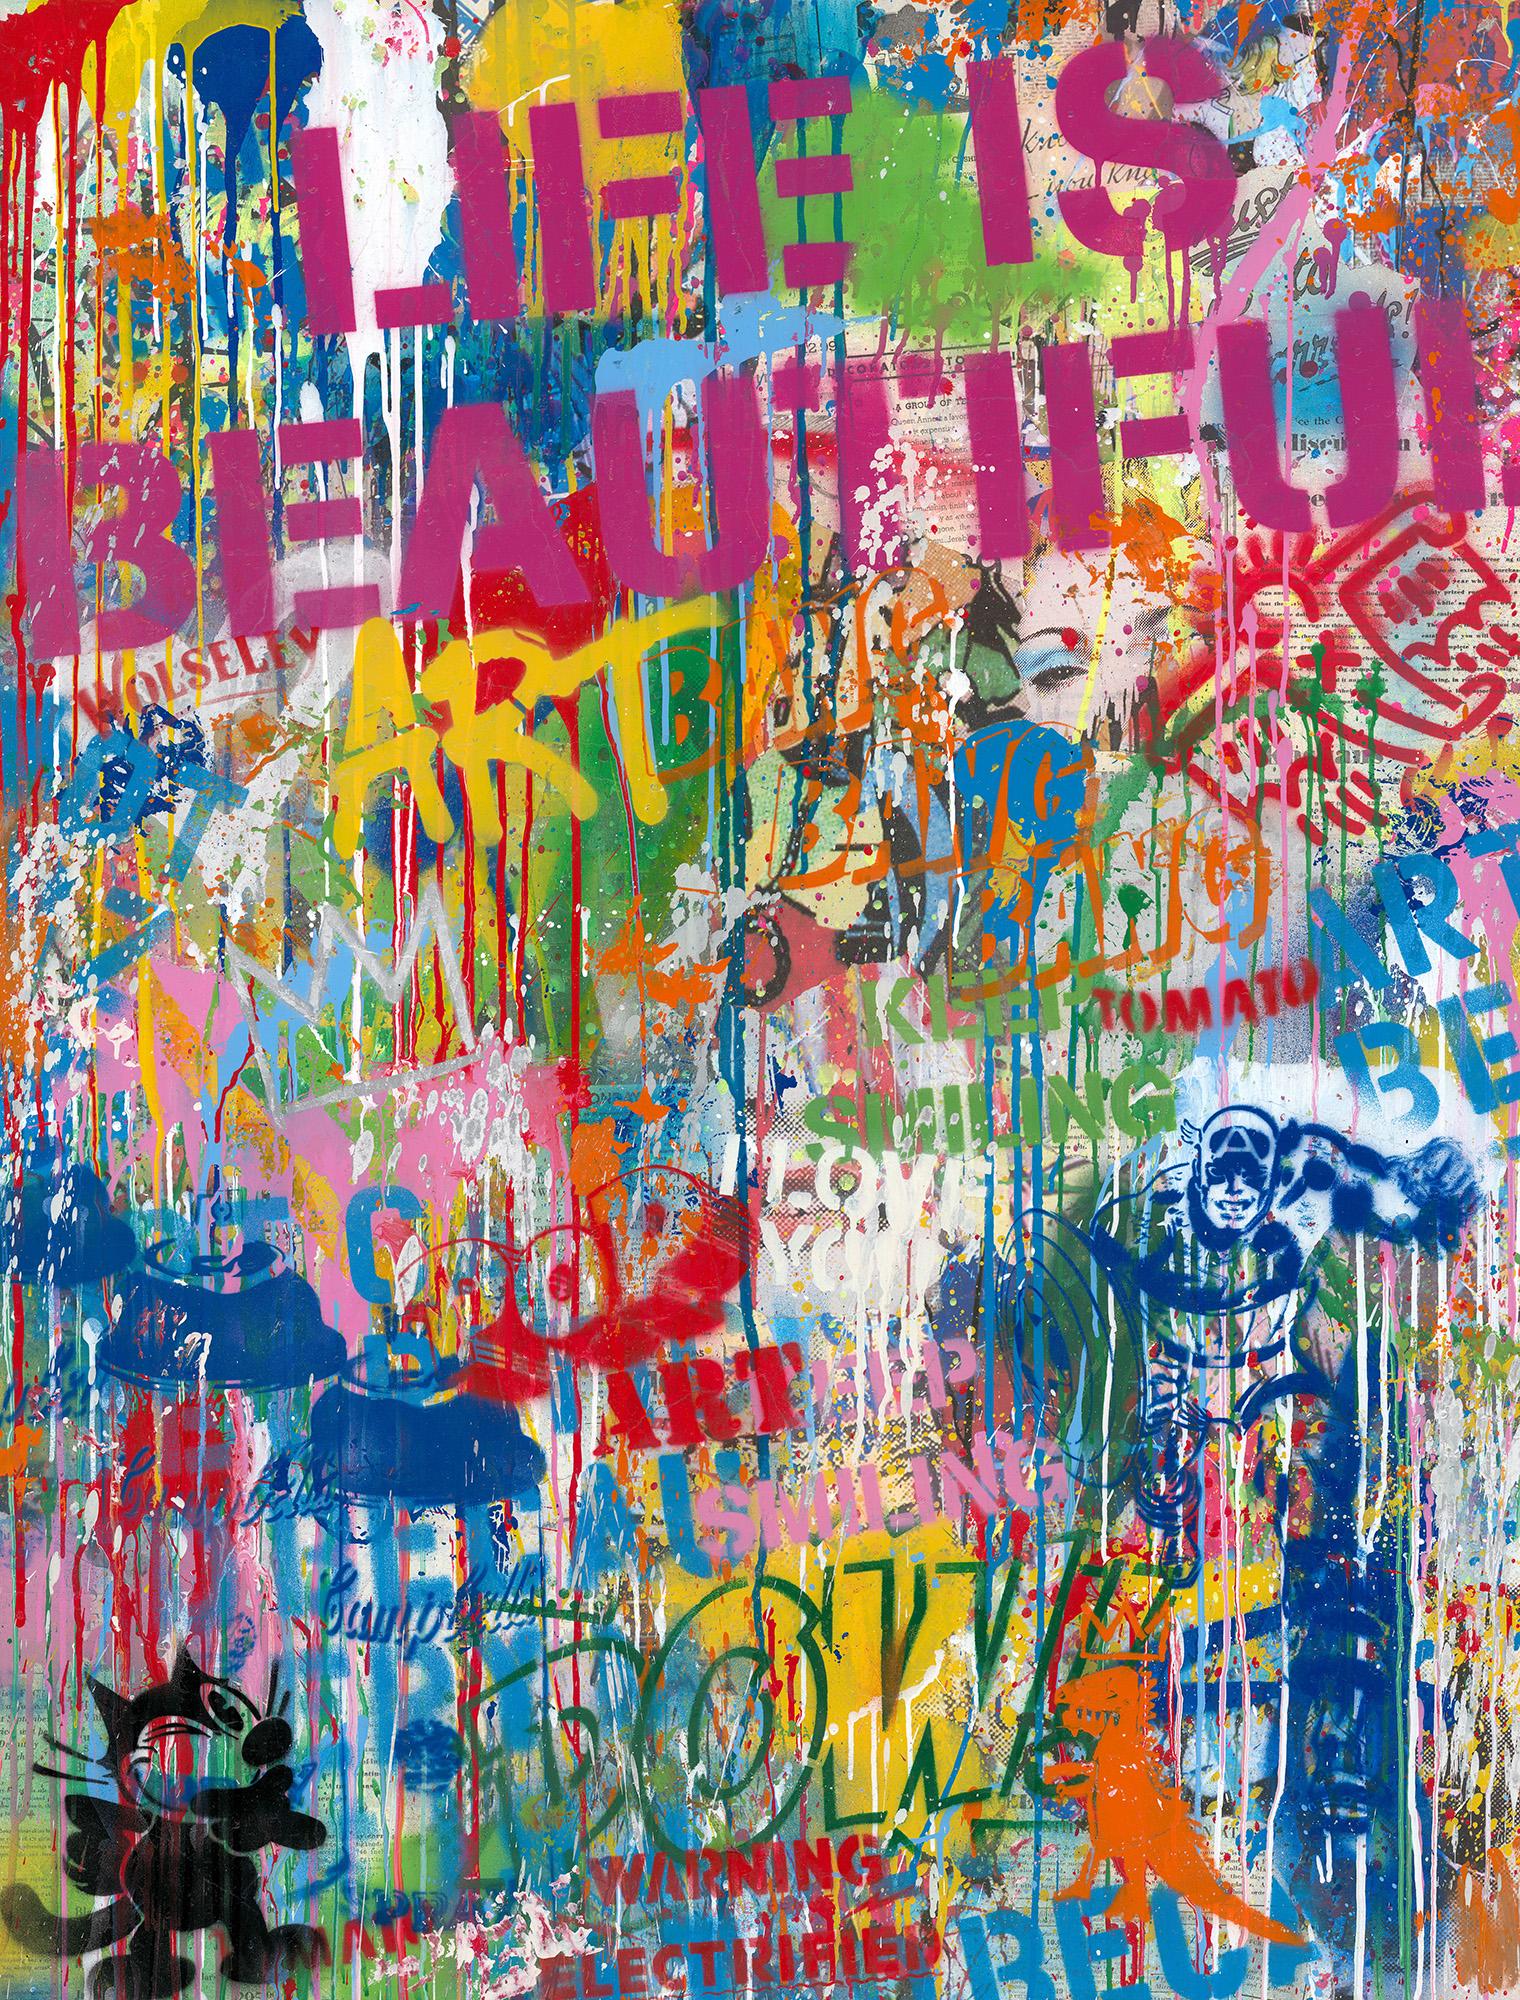 Mr. Brainwash - Street Wall , 9003-012-105